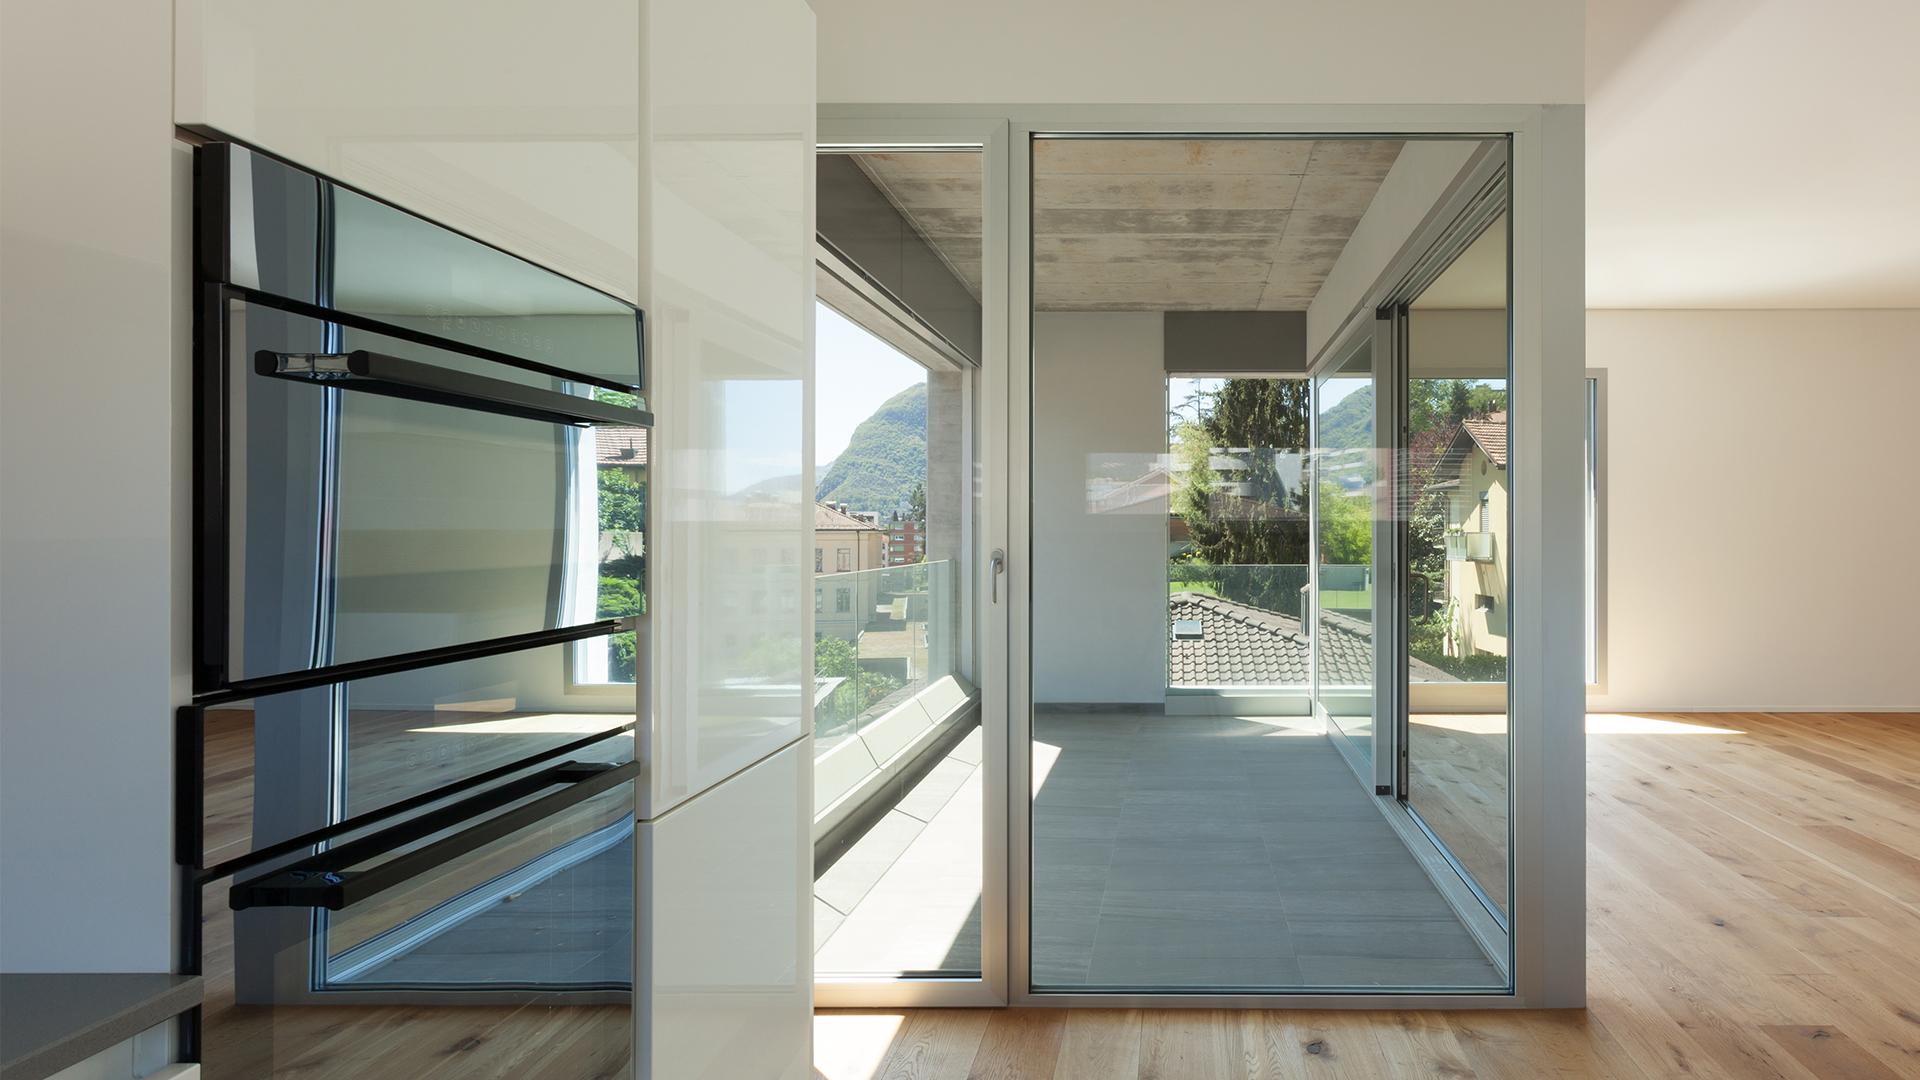 Glasbau Thiemonds – Innovativer Glas- und Rahmenbau